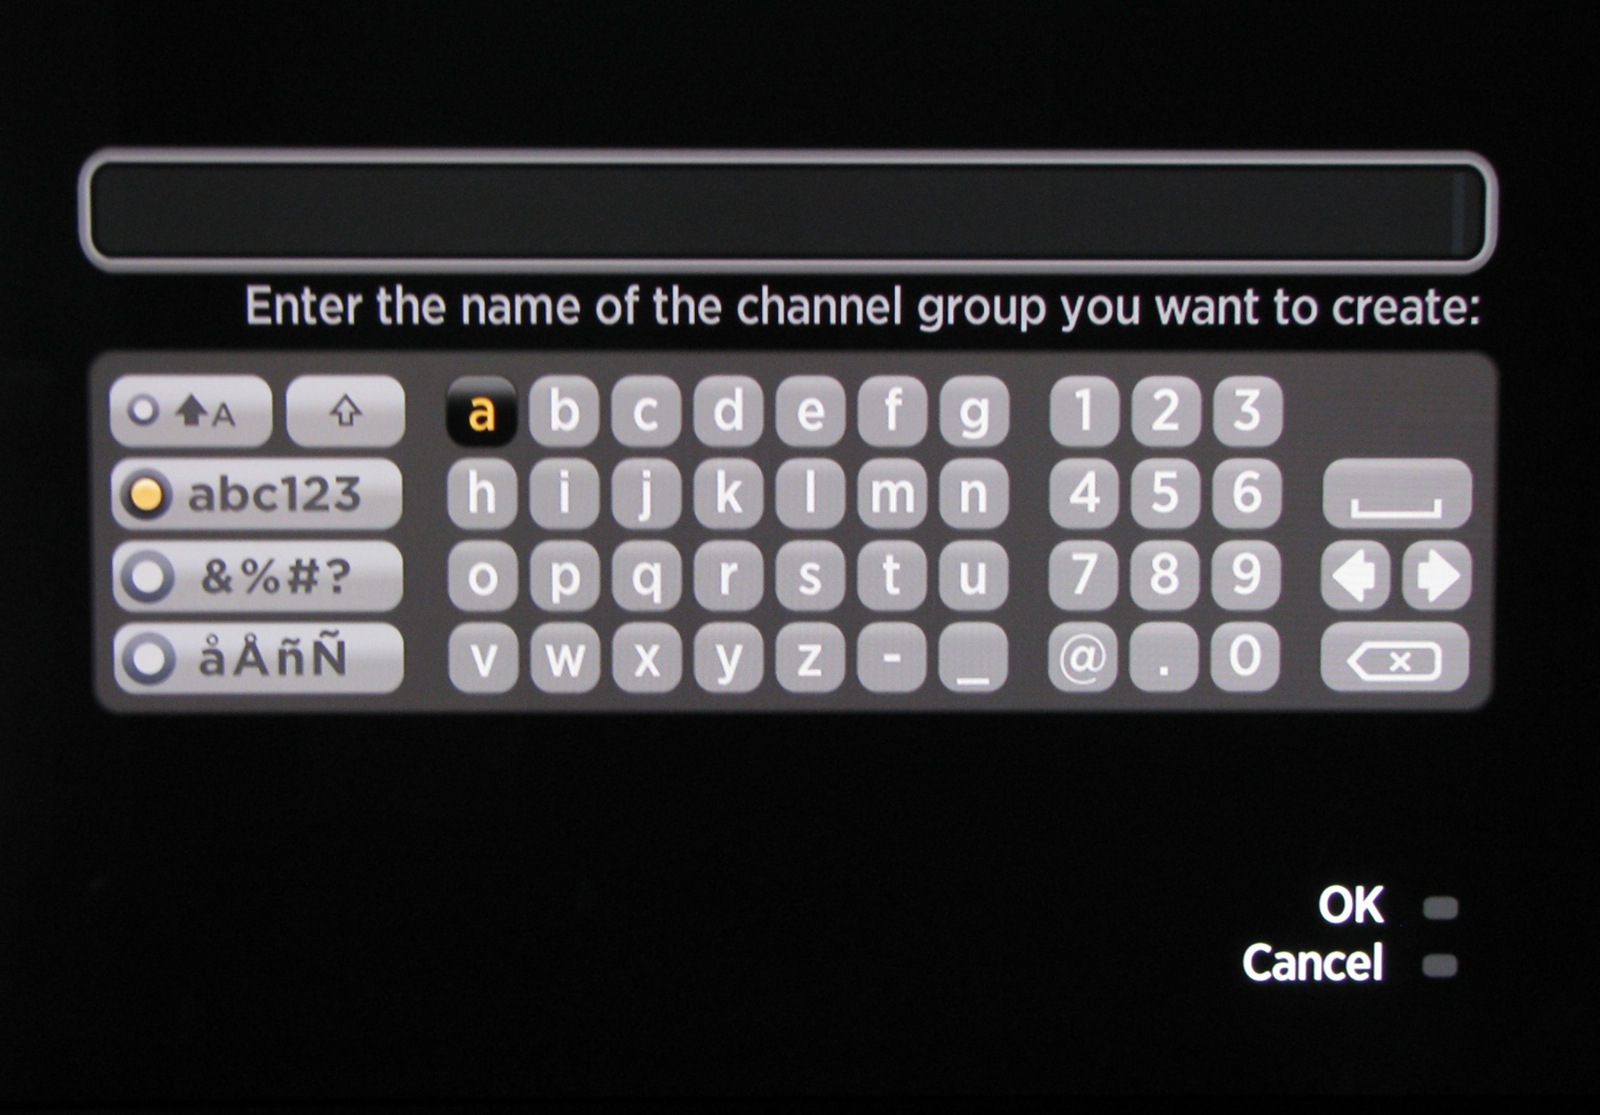 UK Roku Channels: UK Roku Private Channel - My Channels